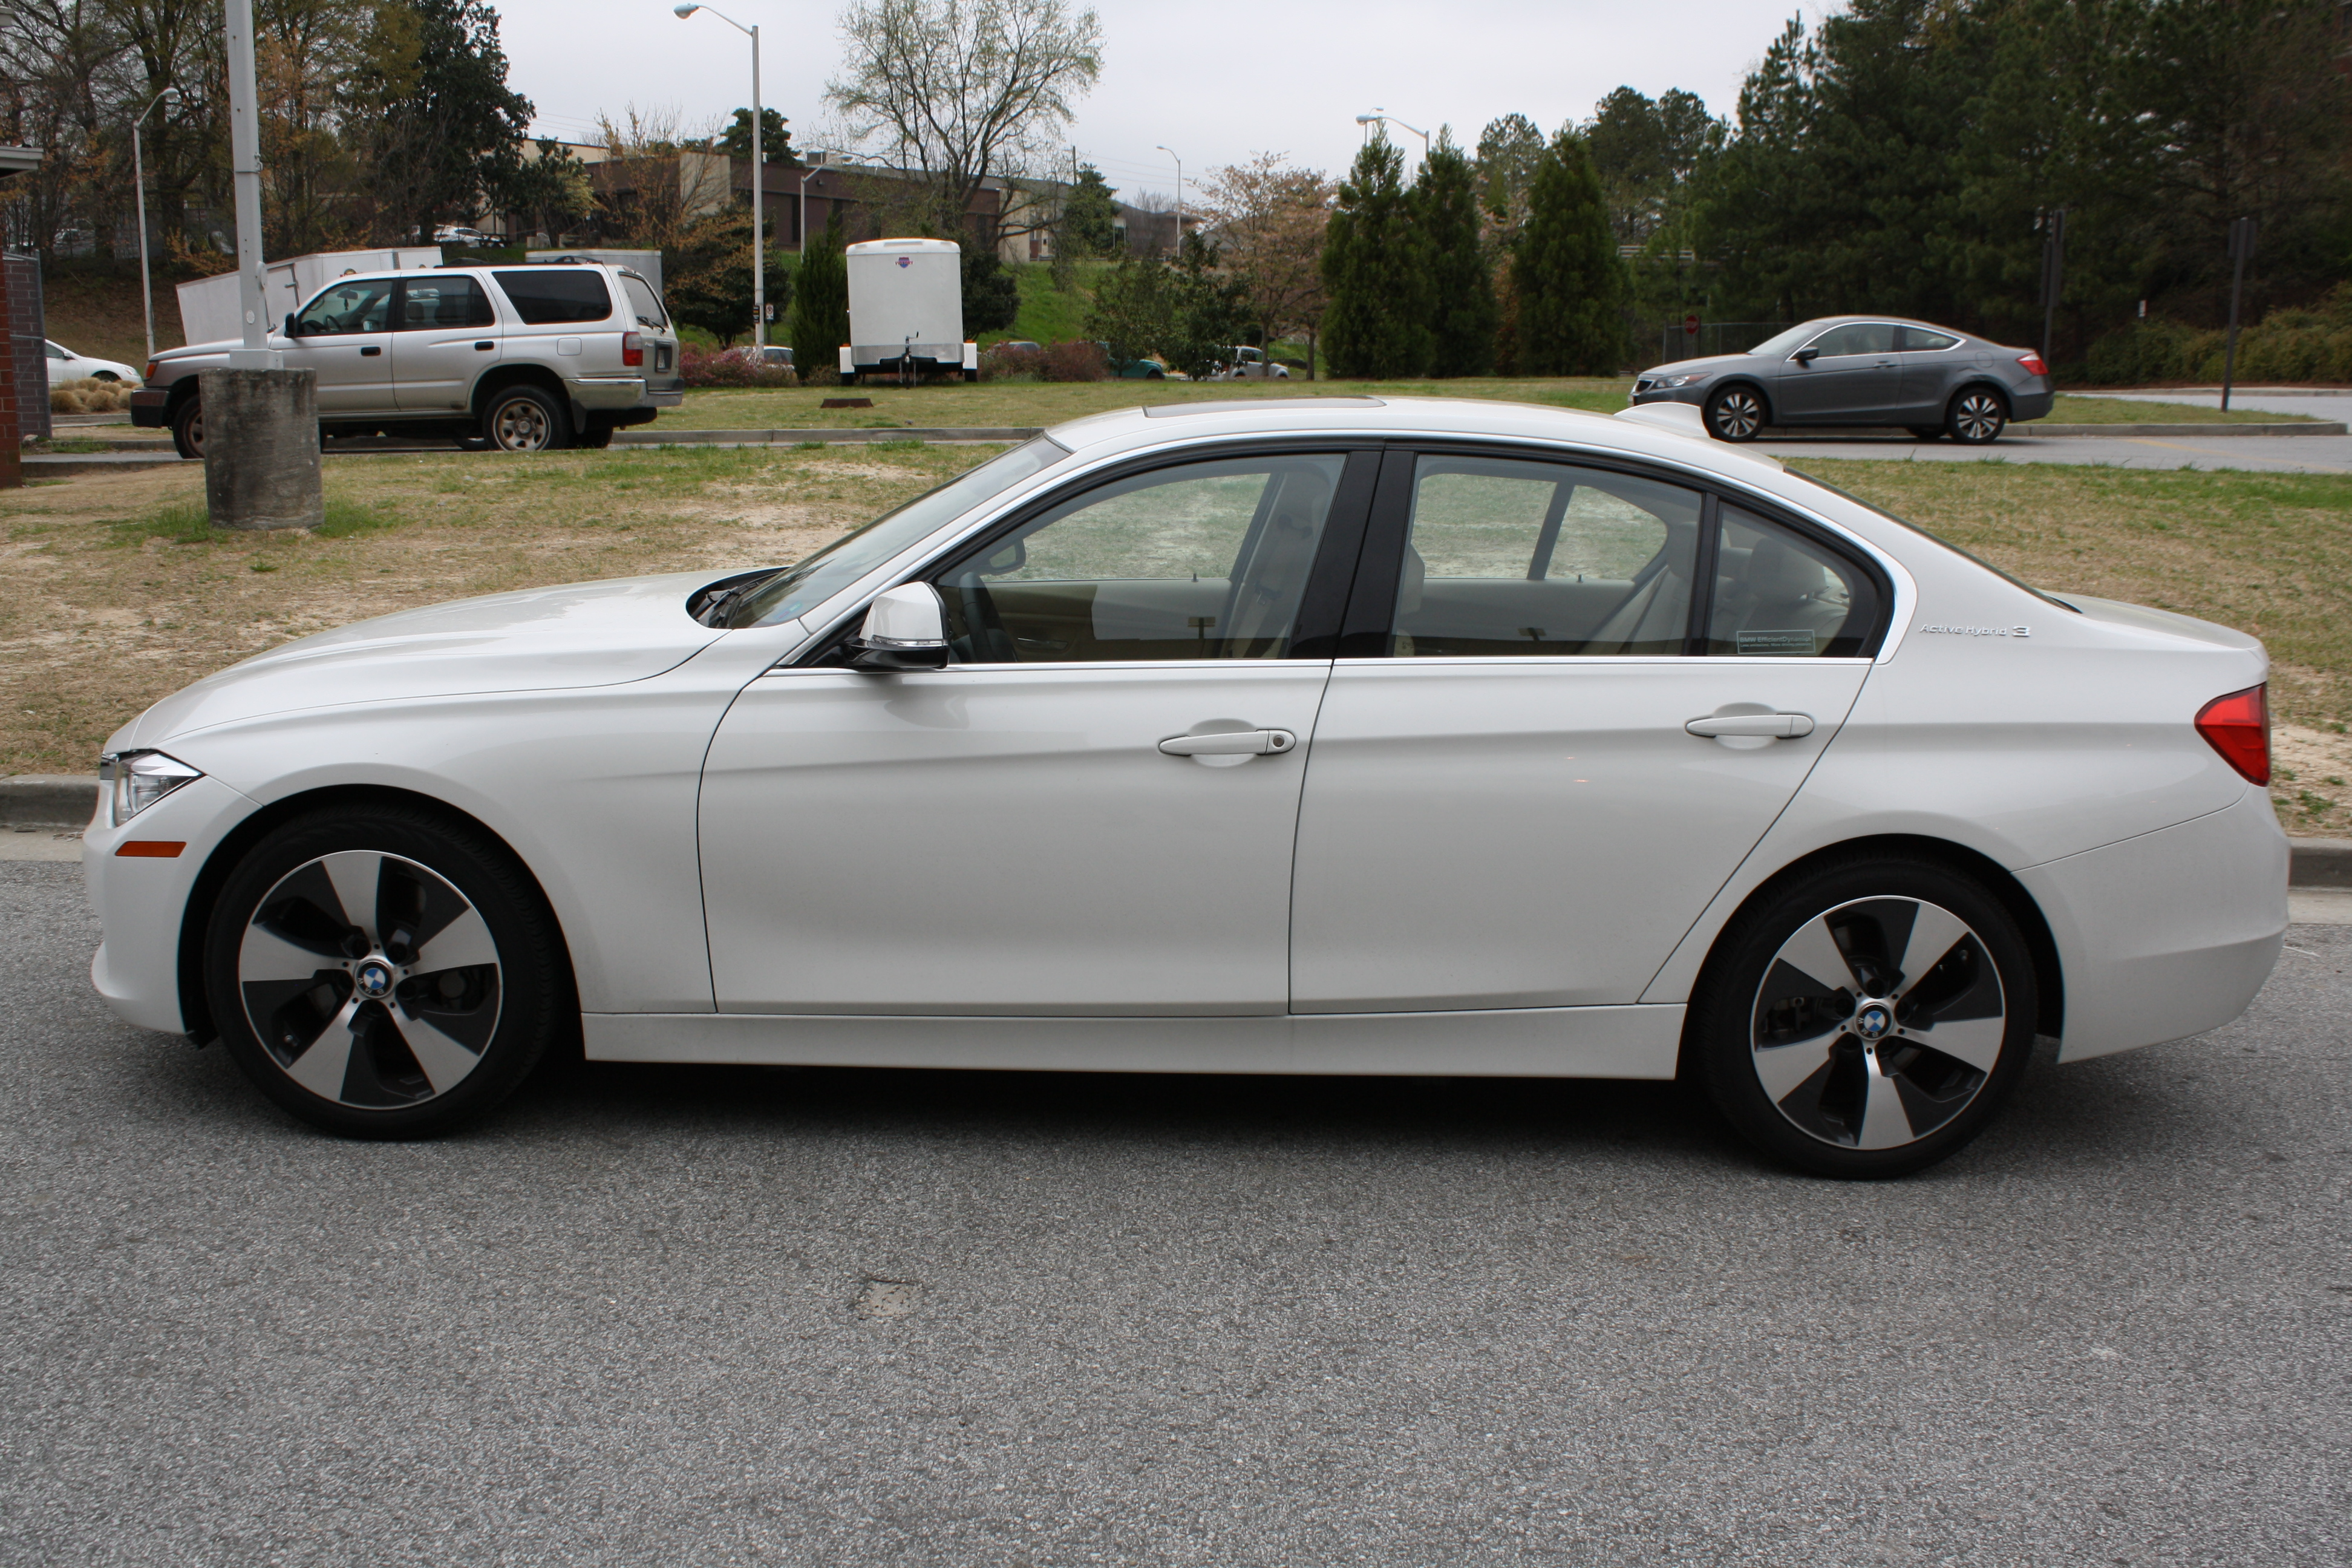 BMW I Hybrid Diminished Value Car Appraisal - Bmw 335i hybrid